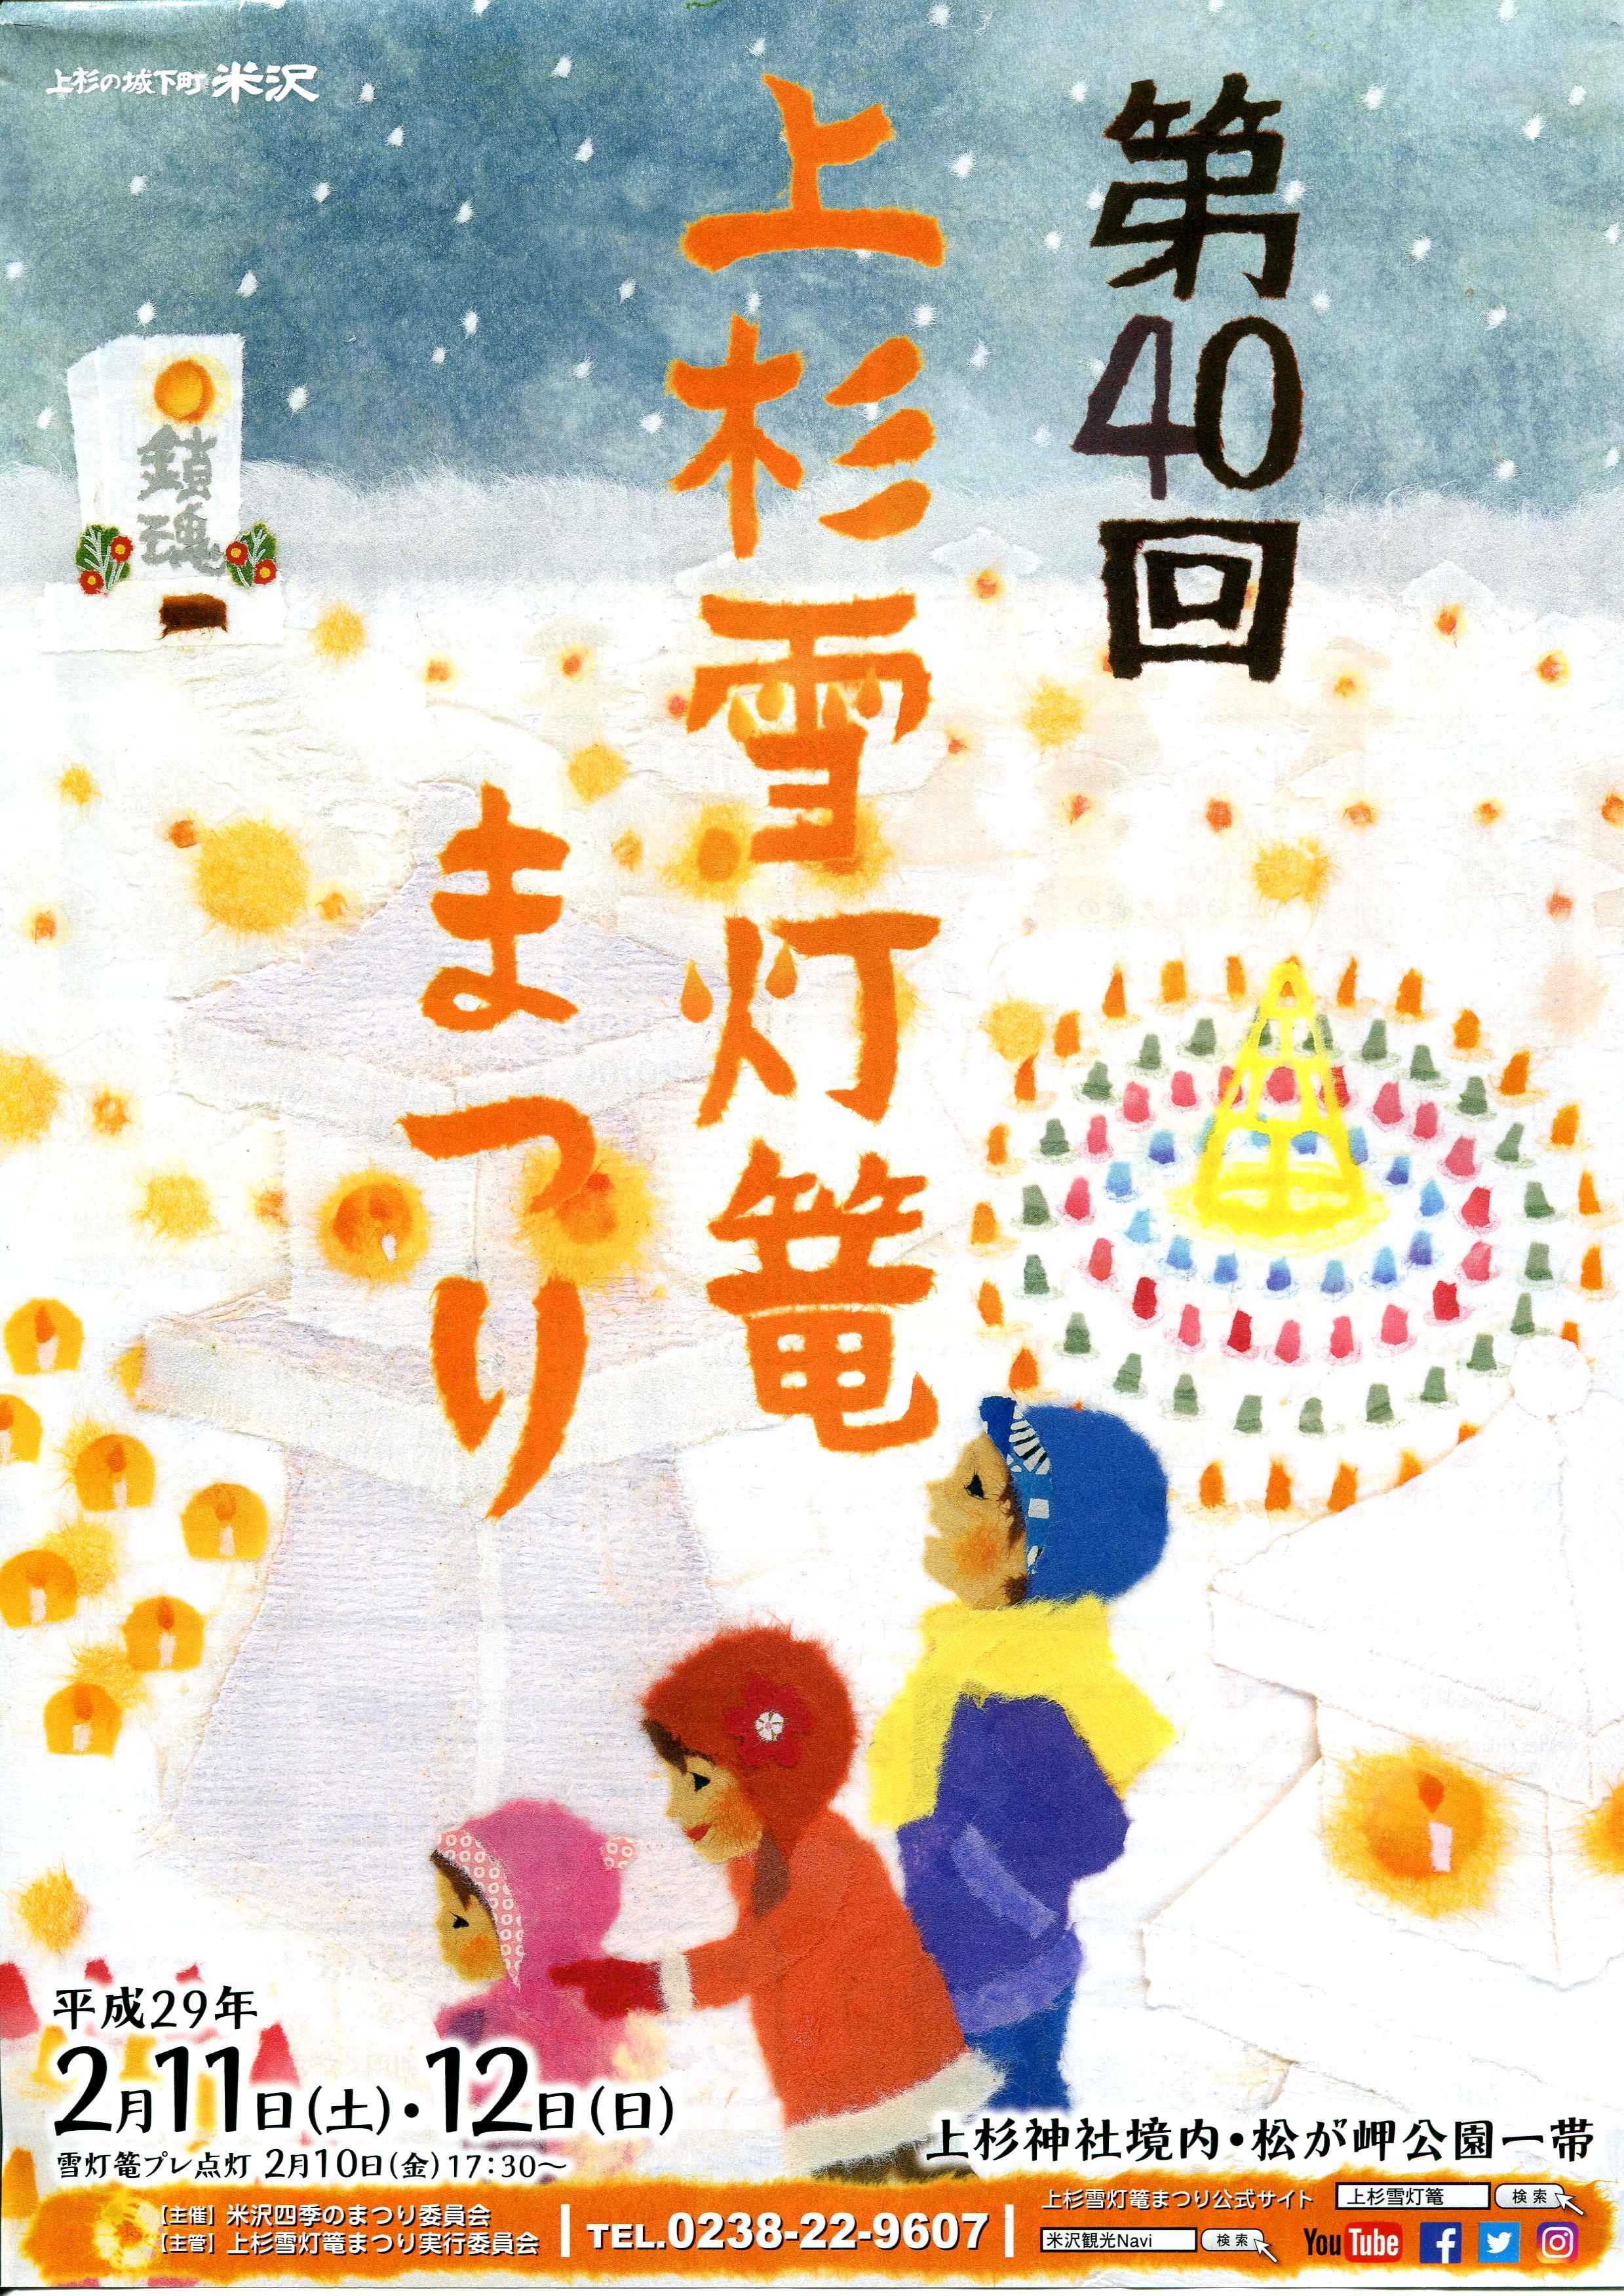 第40回上杉雪灯篭まつり 創作雪像製作団体募集中!:画像